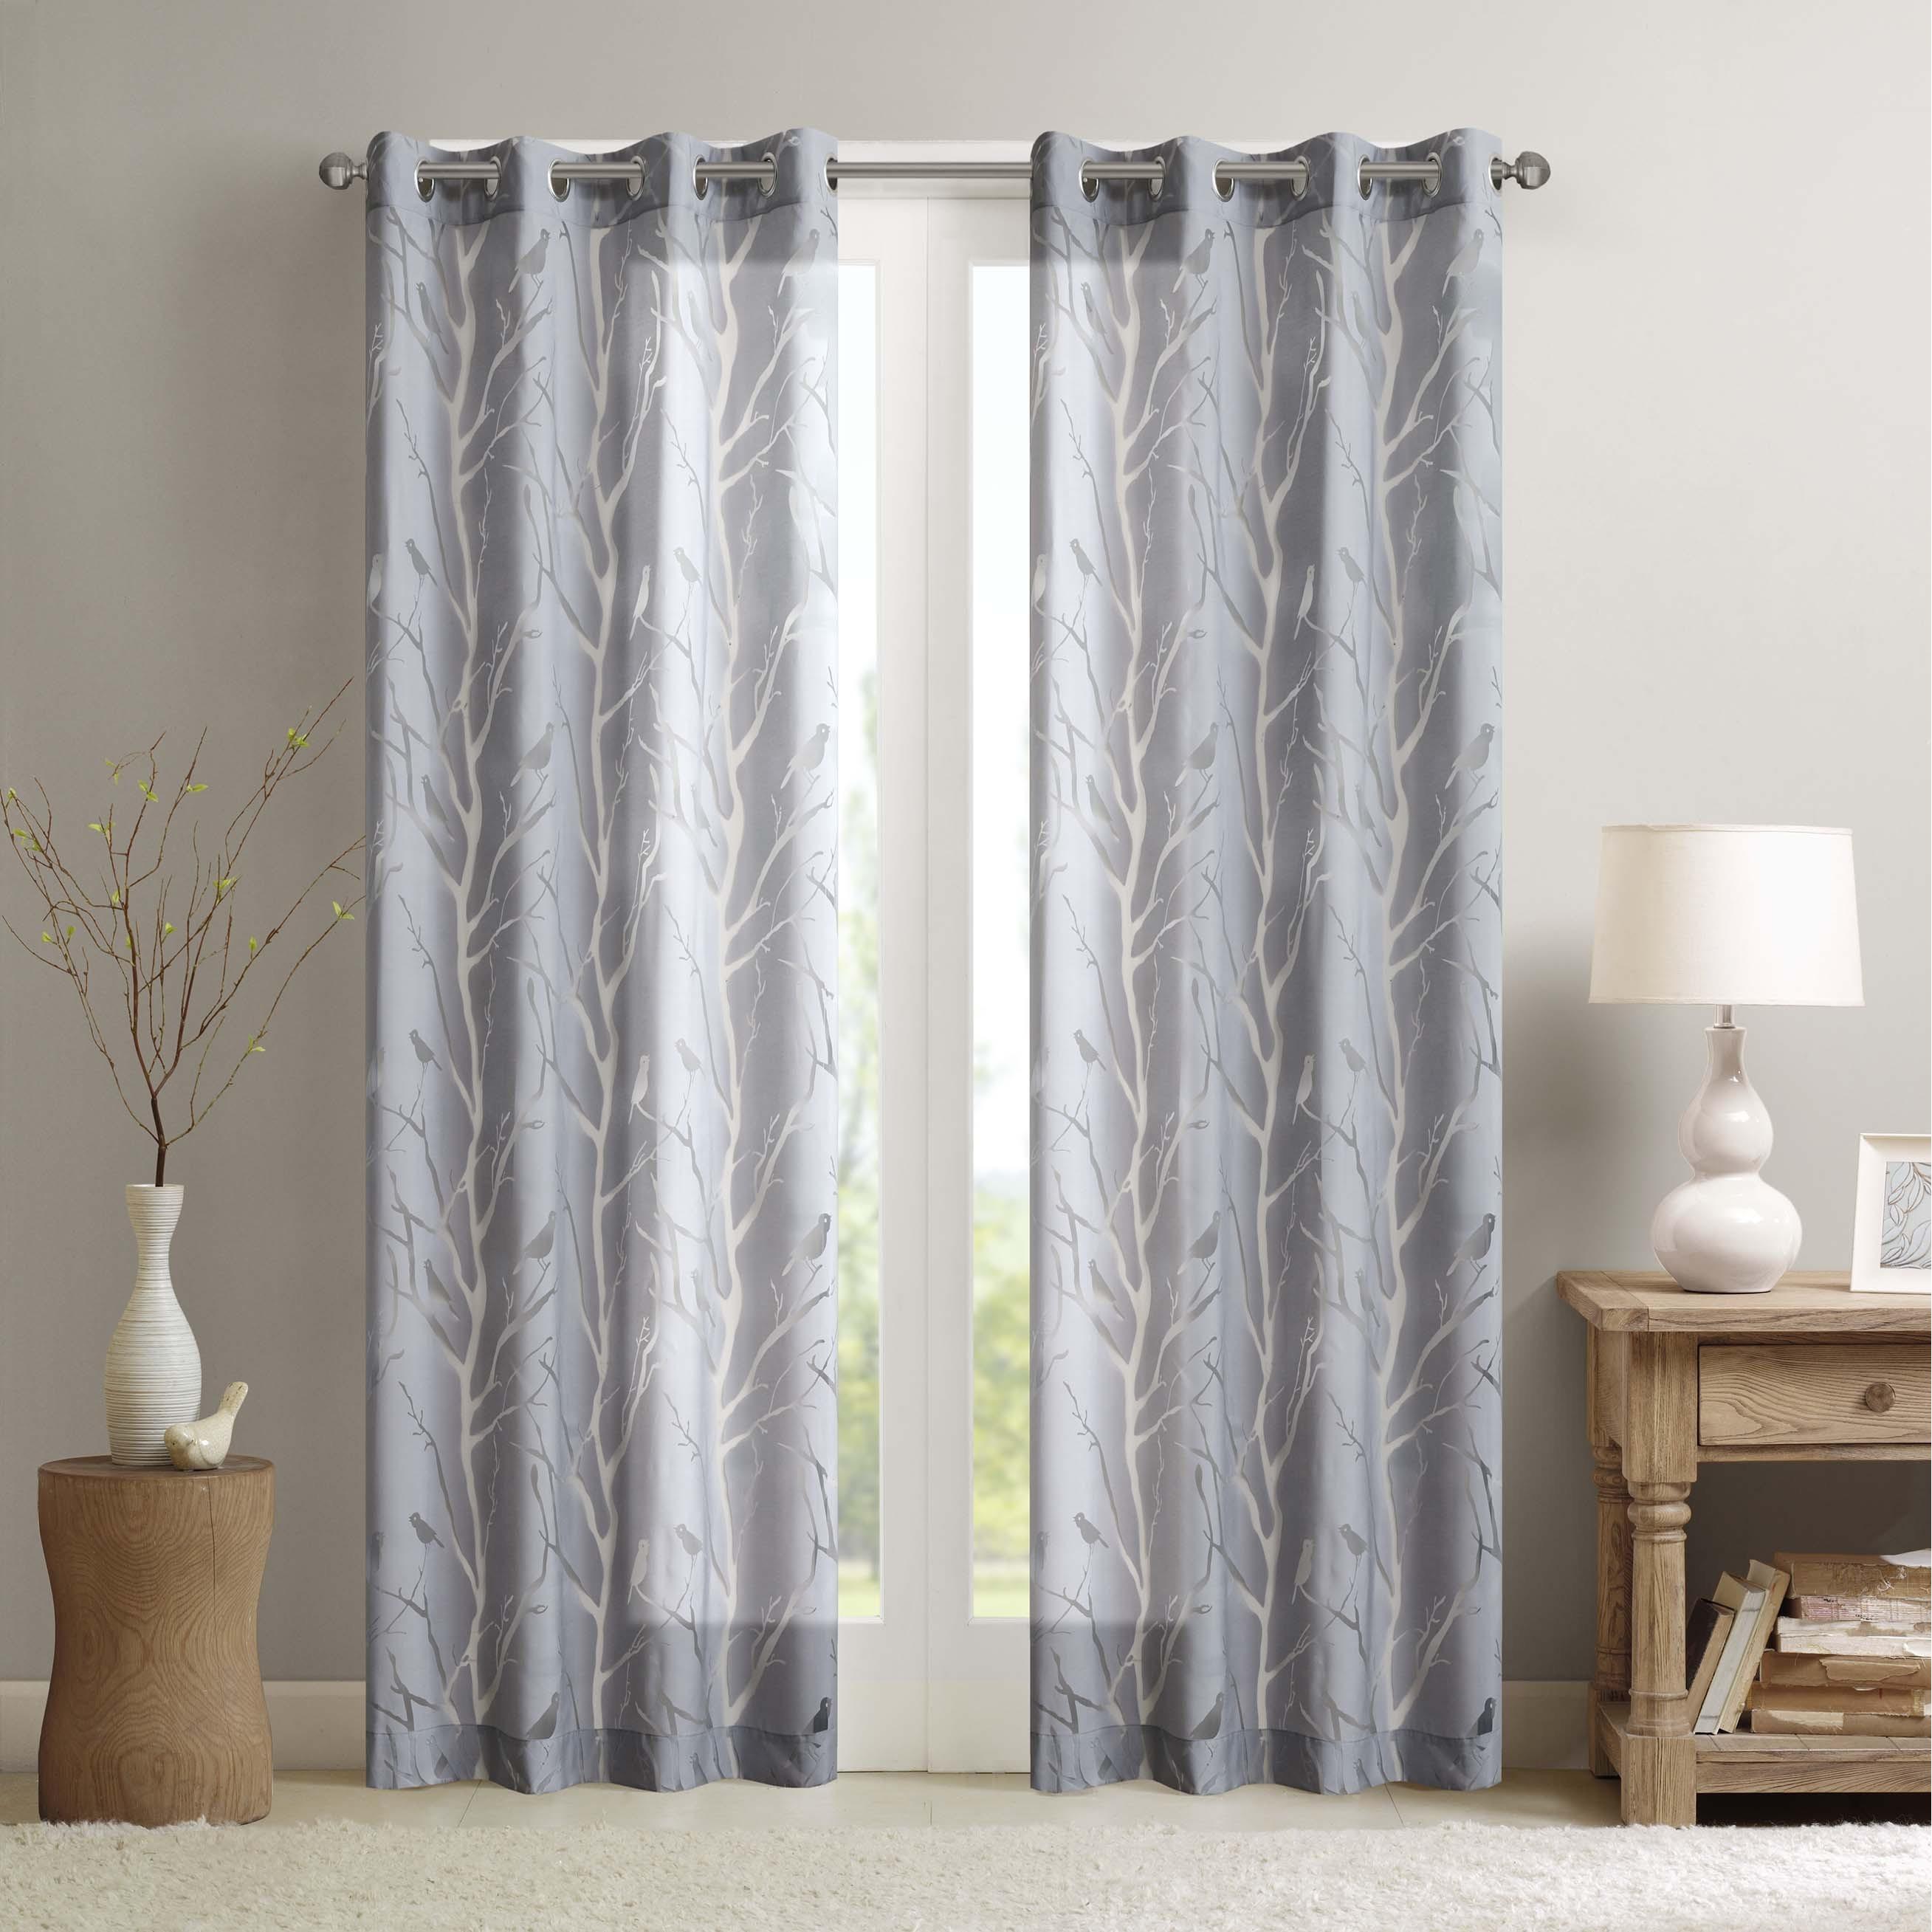 Madison Park Vina Sheer Bird Single Curtain Panel Pertaining To Vina Sheer Bird Single Curtain Panels (View 2 of 30)